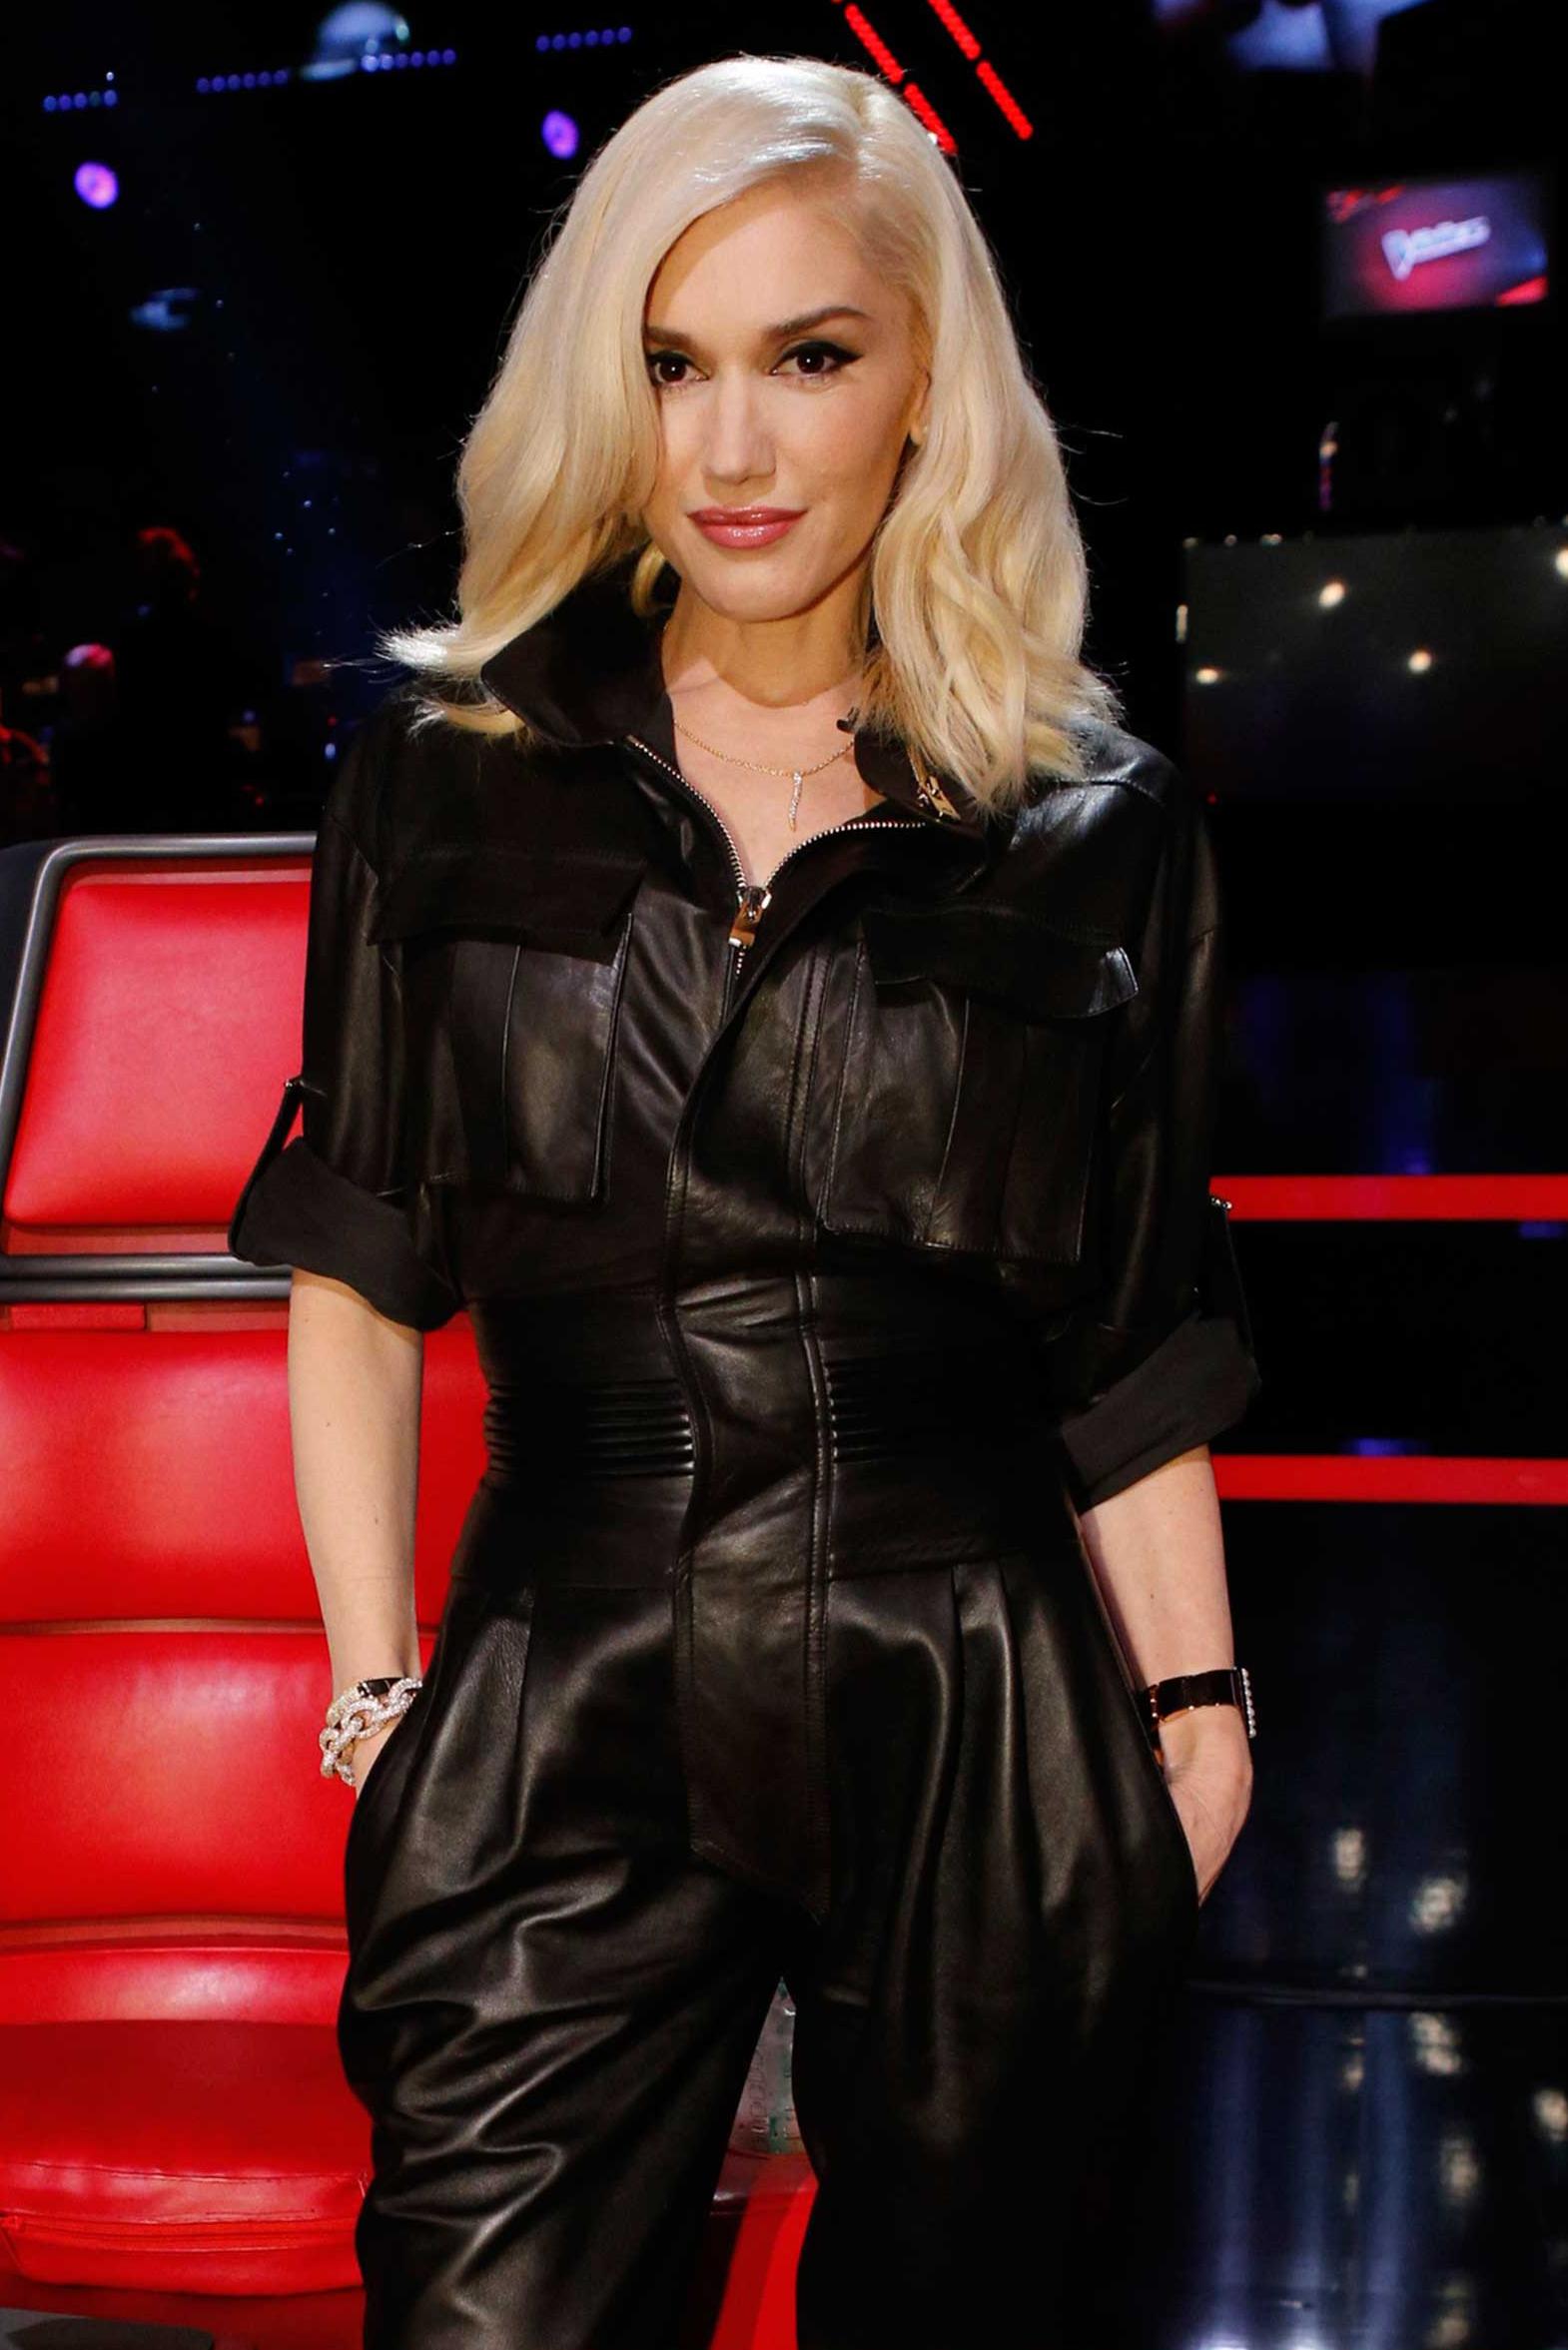 THE VOICE --  Live Show  Episode 713C -- Pictured: Gwen Stefani  -- (Photo by: Trae Patton/NBC/NBCU Photo Bank via Getty Images)